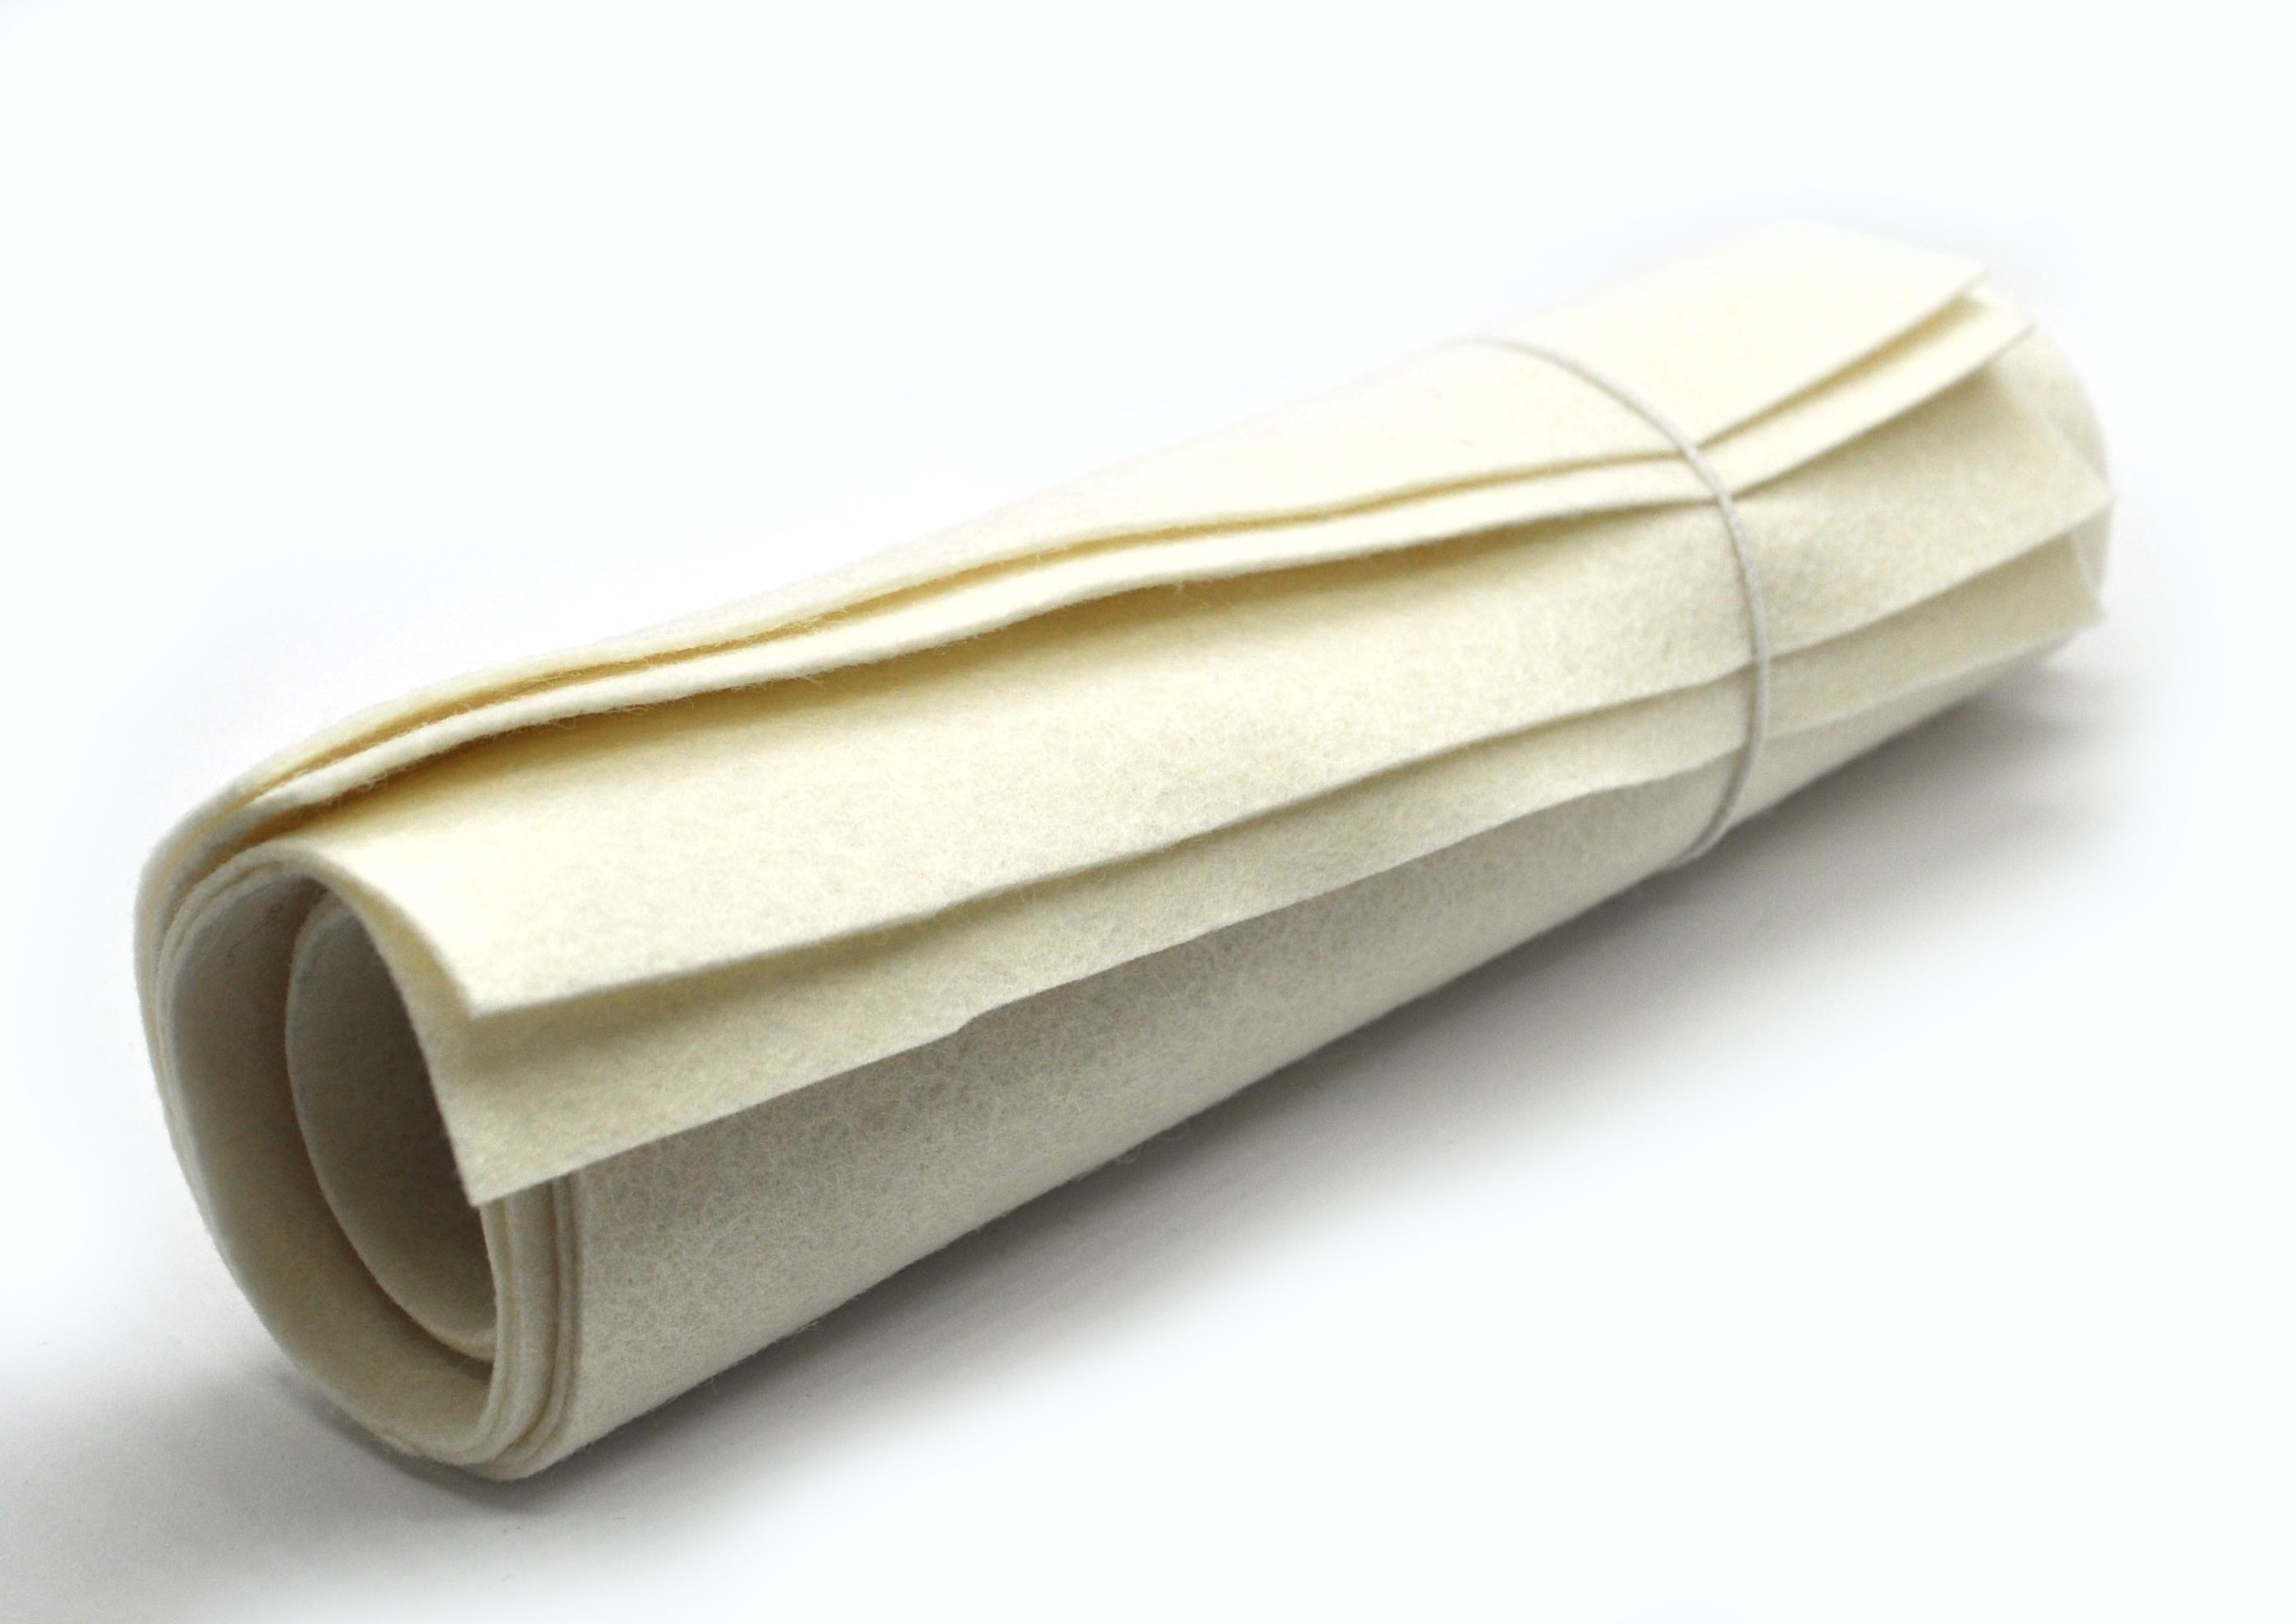 feutre blanc 220 160mm a l unit boutique reeds on line. Black Bedroom Furniture Sets. Home Design Ideas